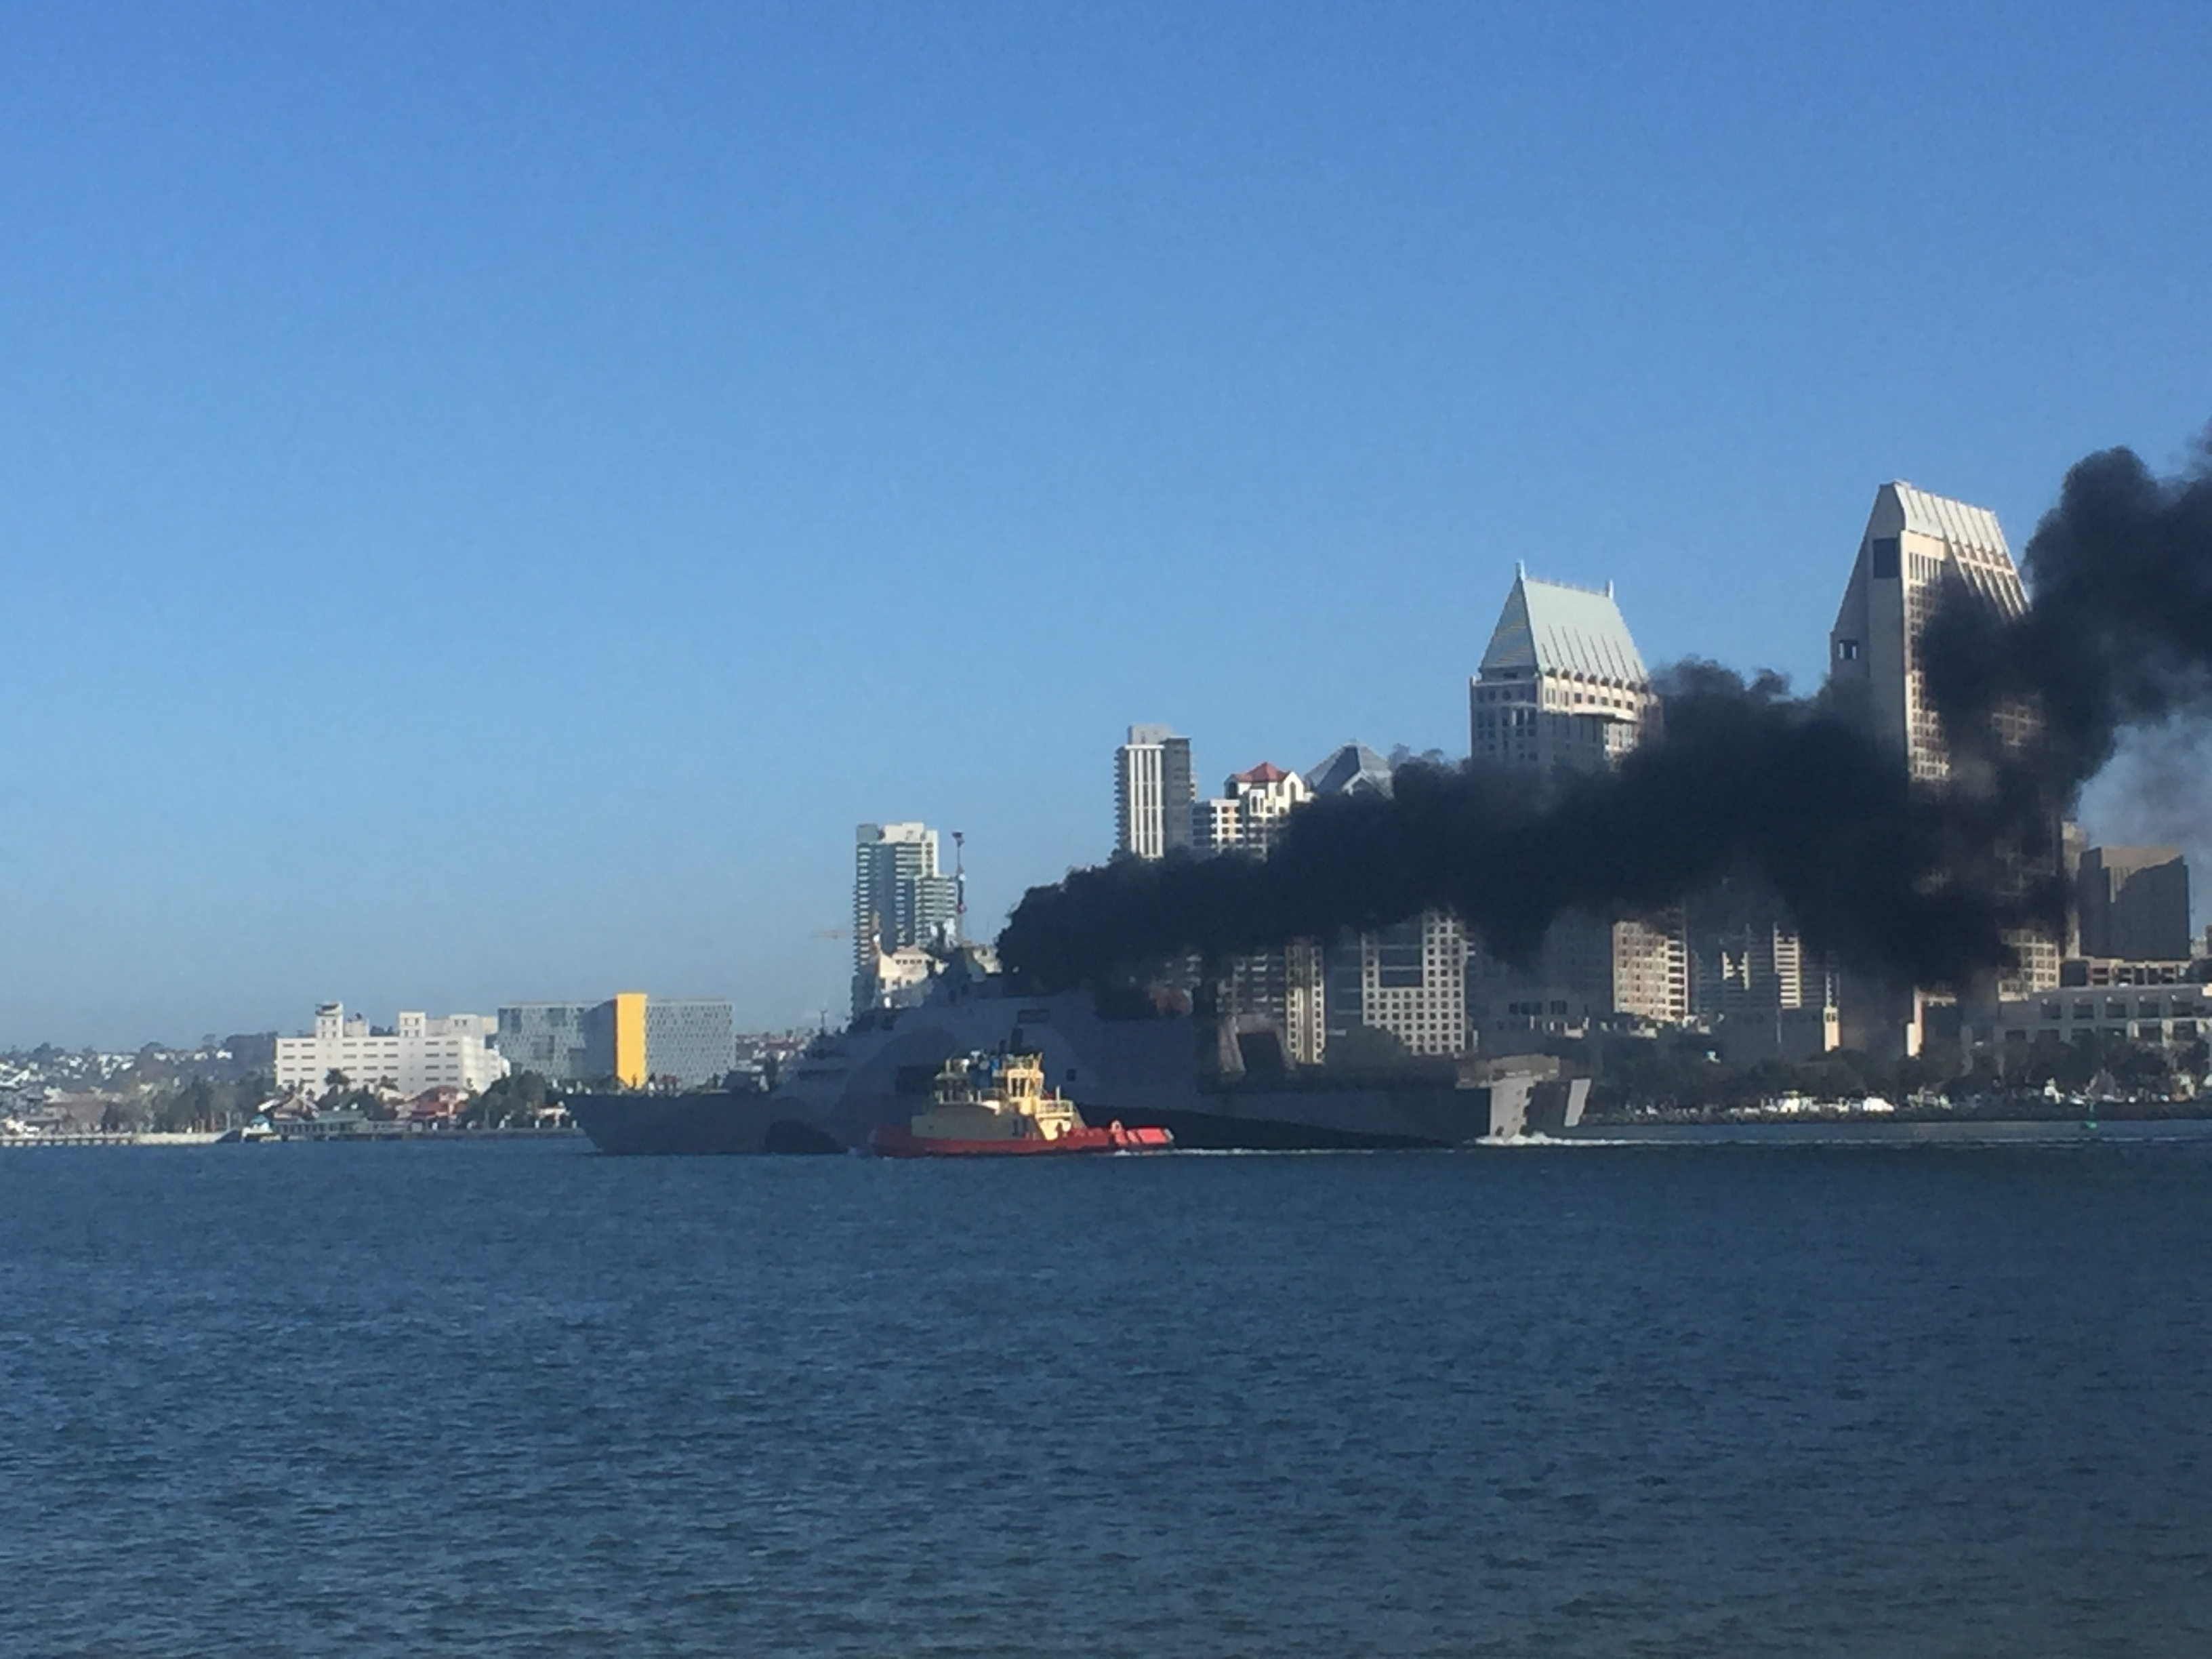 USS Freedom под парами